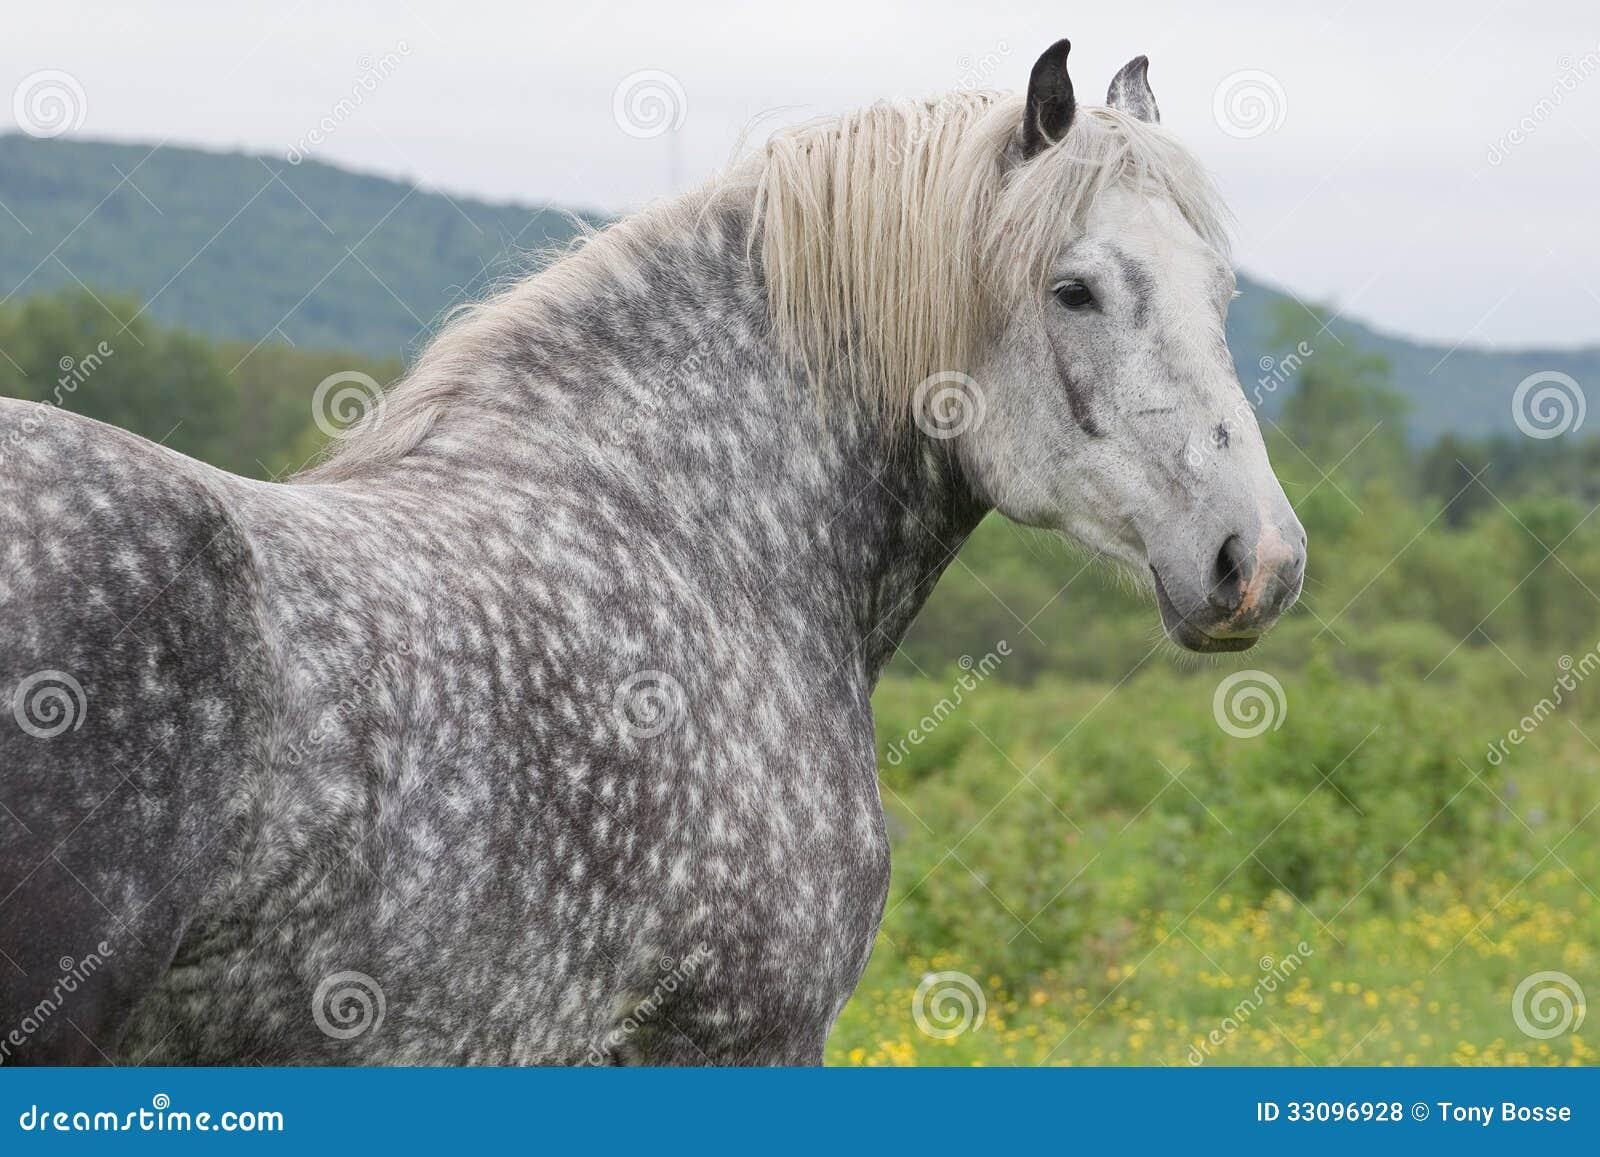 Black percheron horses